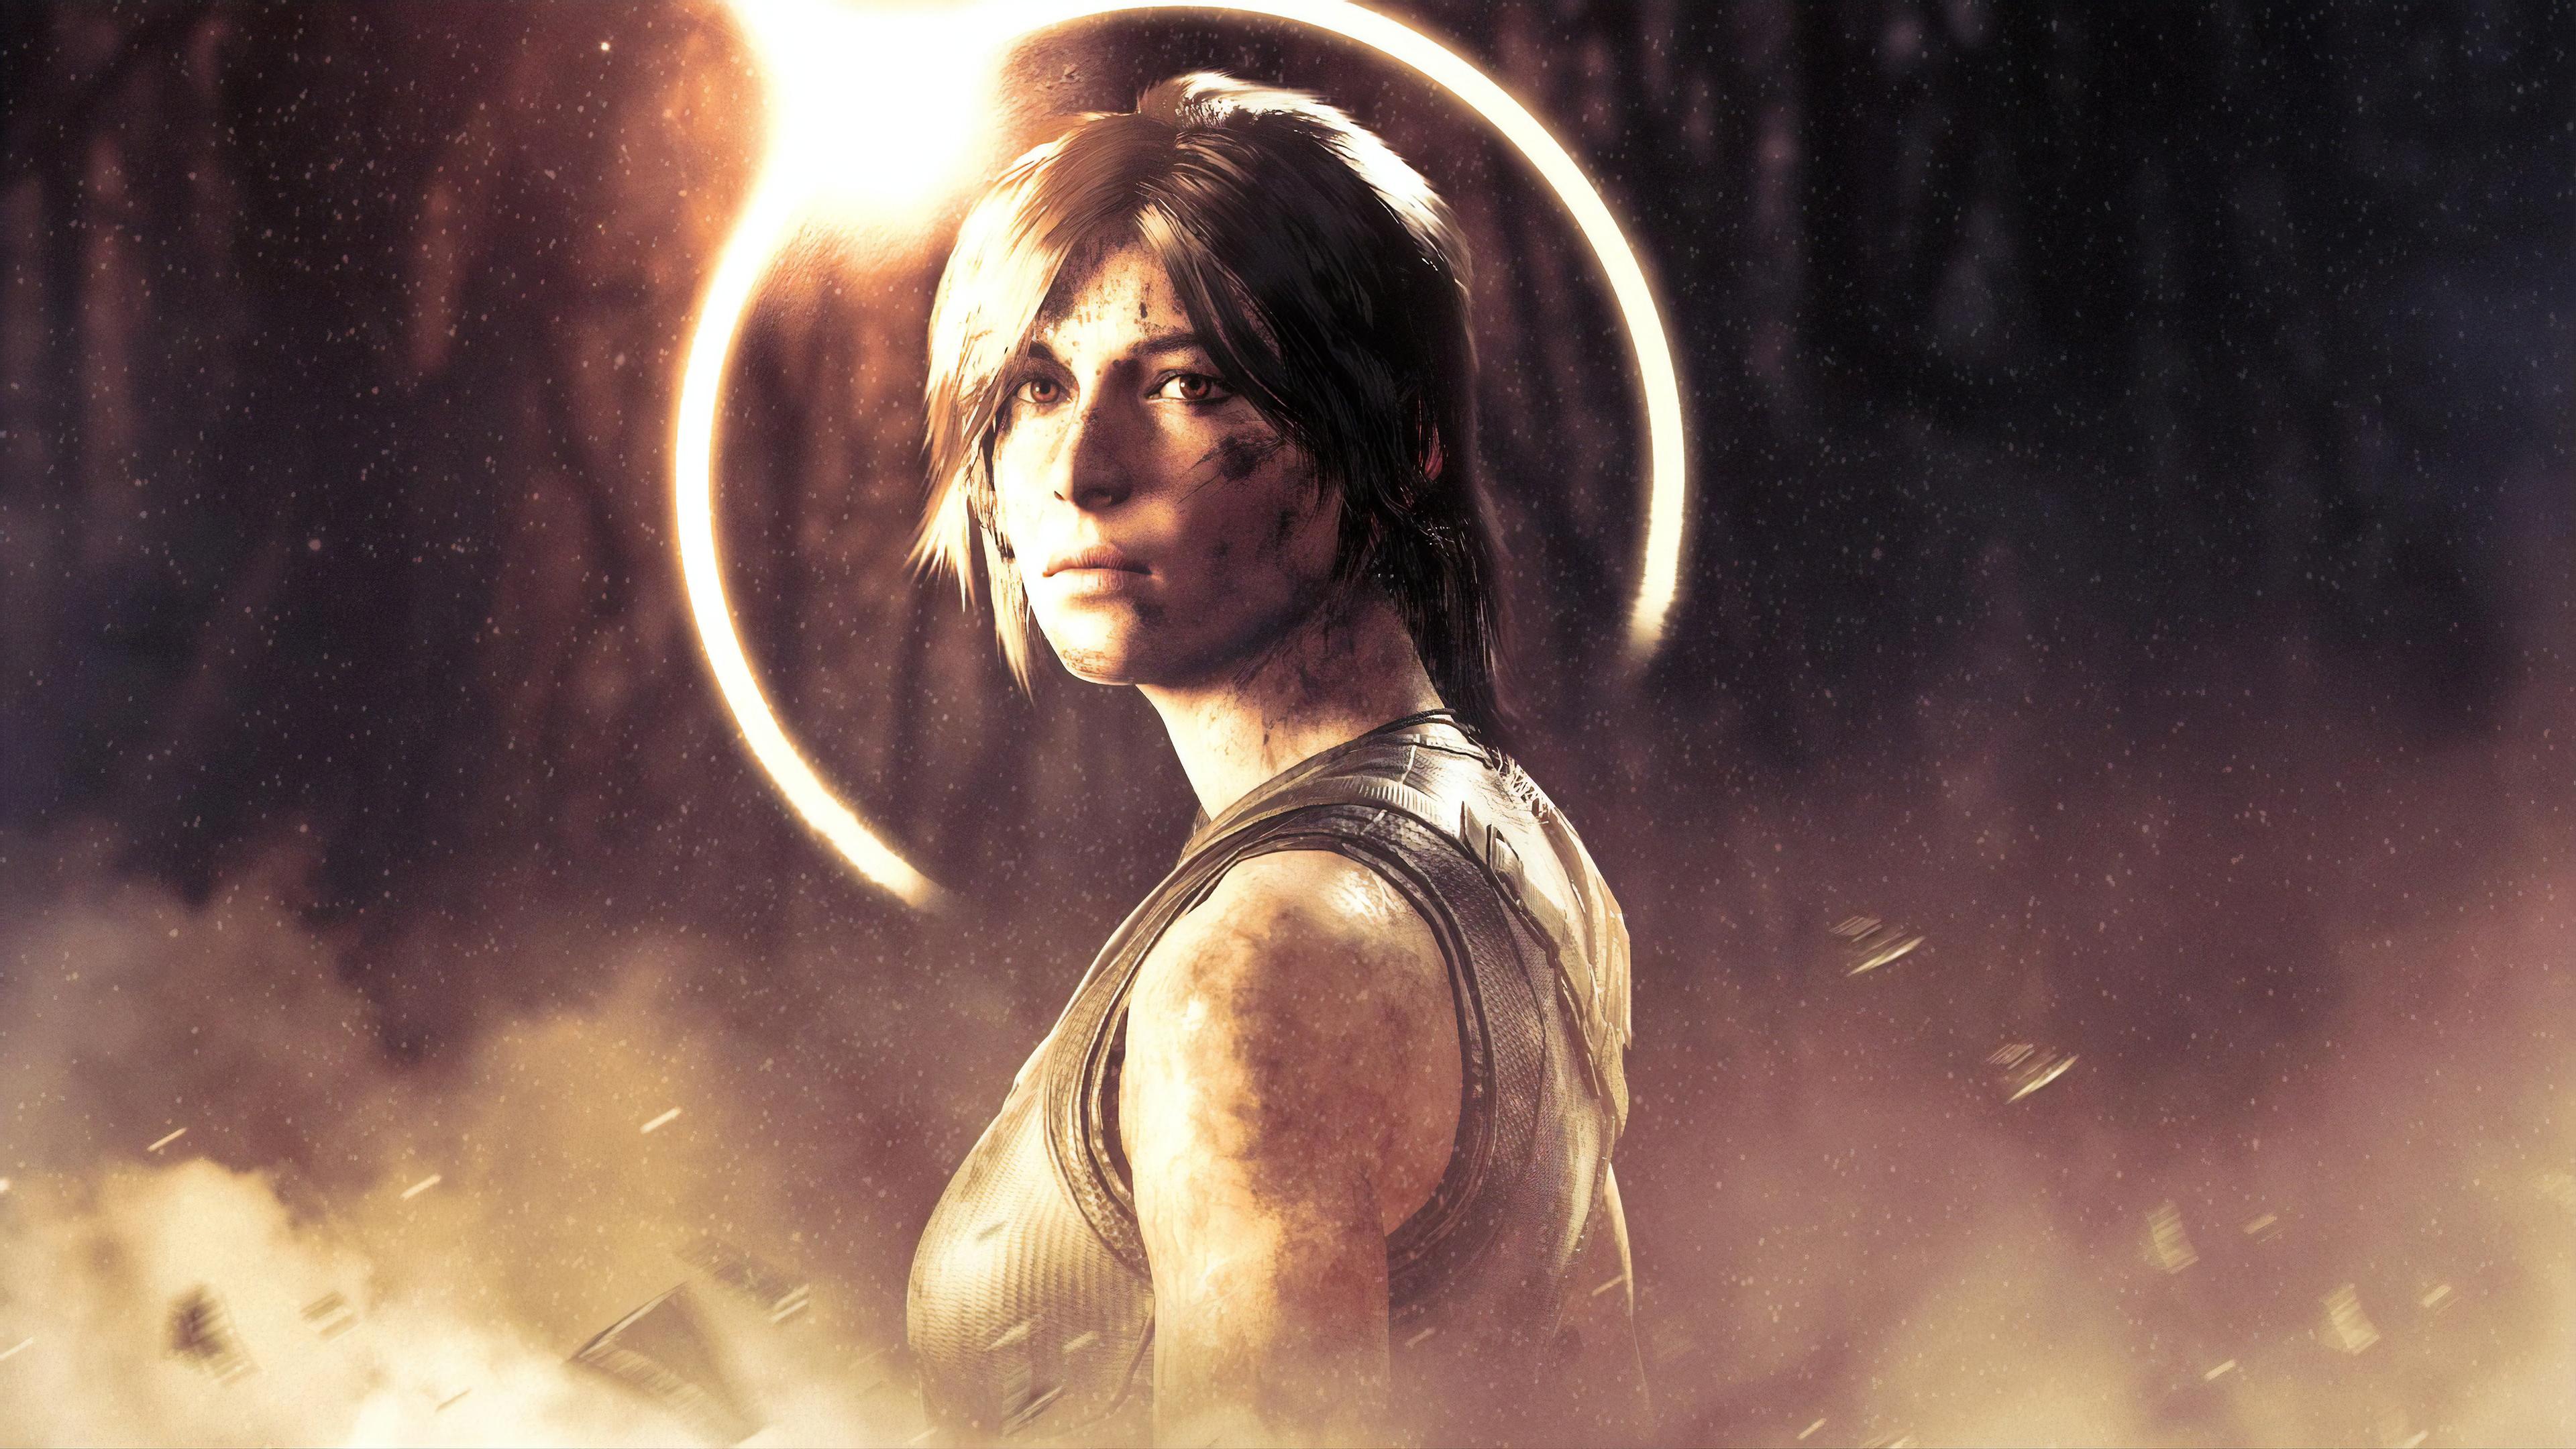 Lara Croft From Shadow Of The Tomb Raider, HD Games, 4k